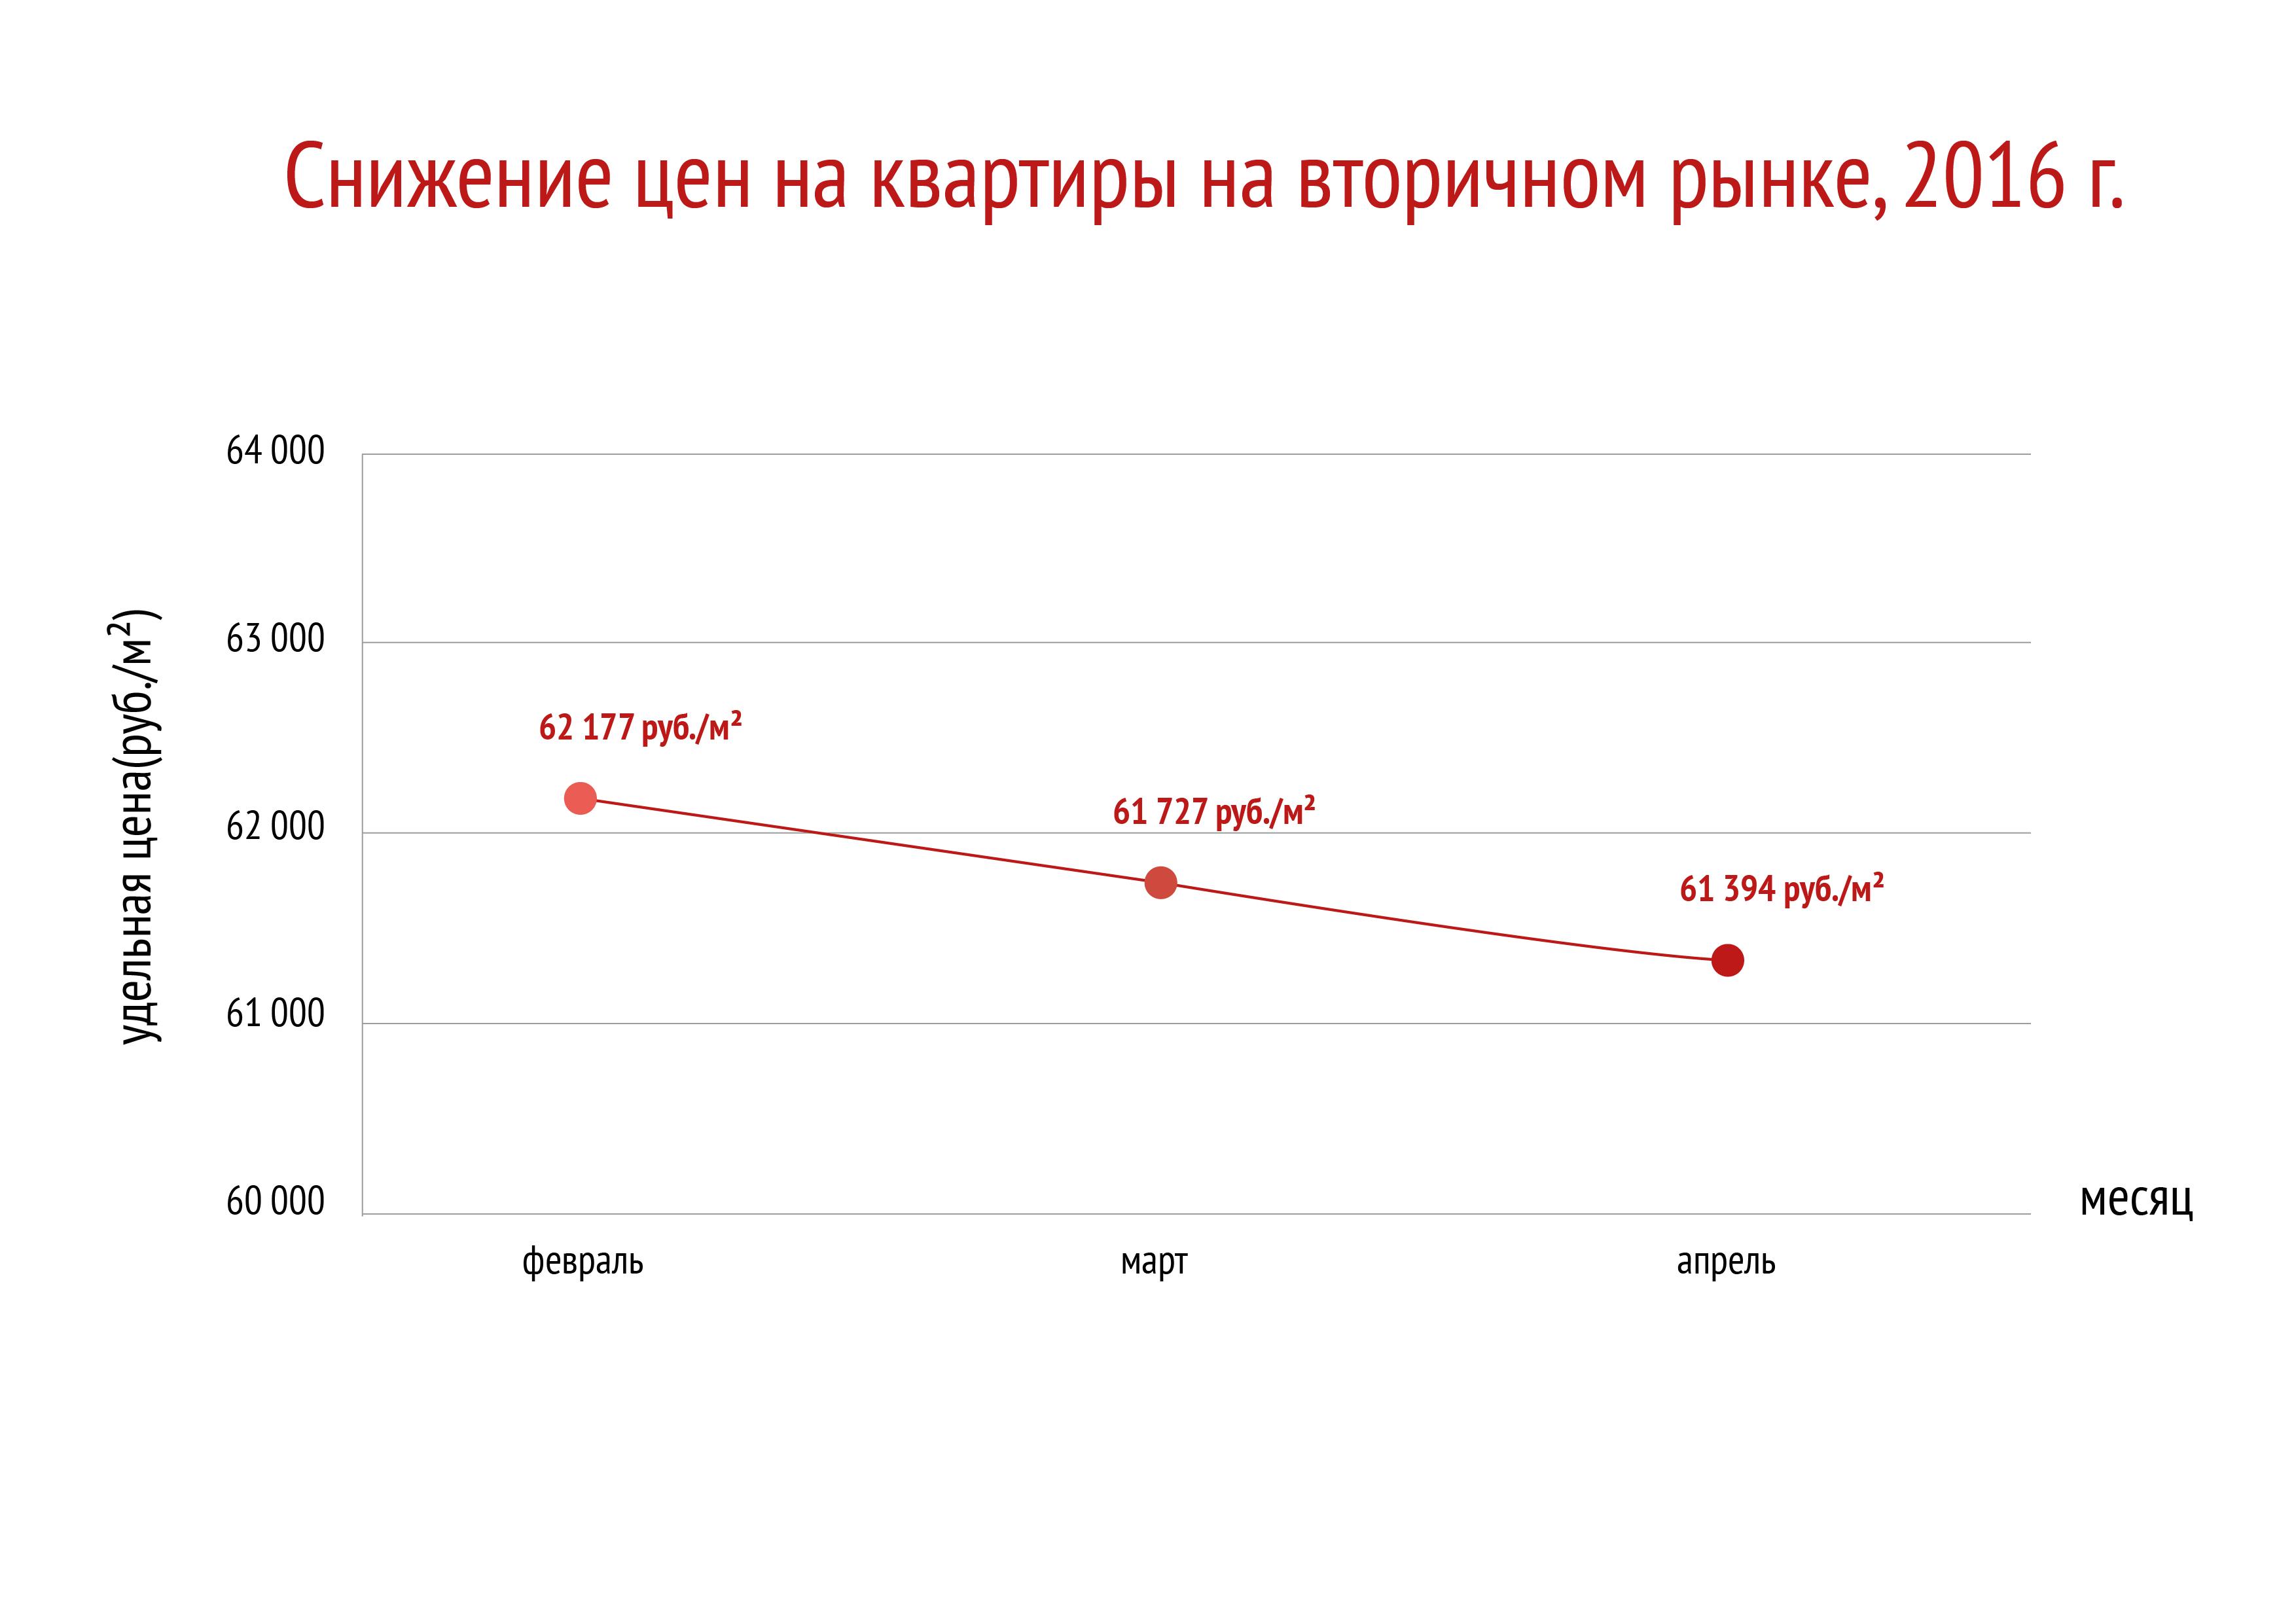 ВКС_Снижение цен на квартиры на вторичном рынке-01 (2).jpg